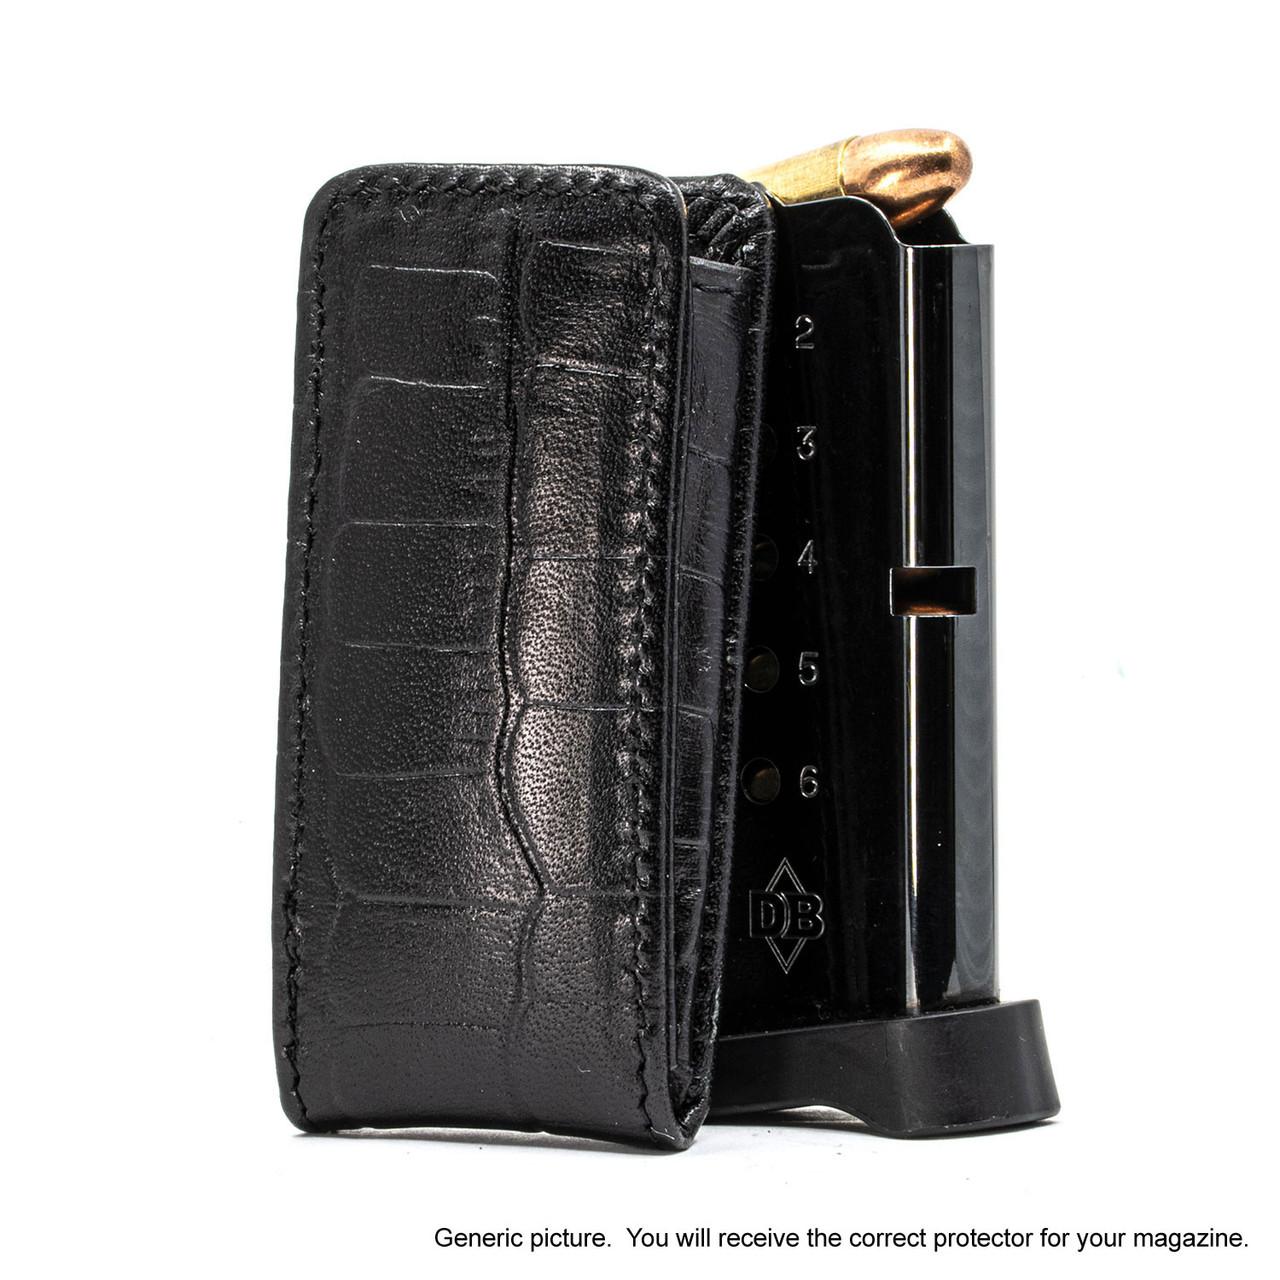 Sphinx SDP Compact Black Alligator Magazine Pocket Protector